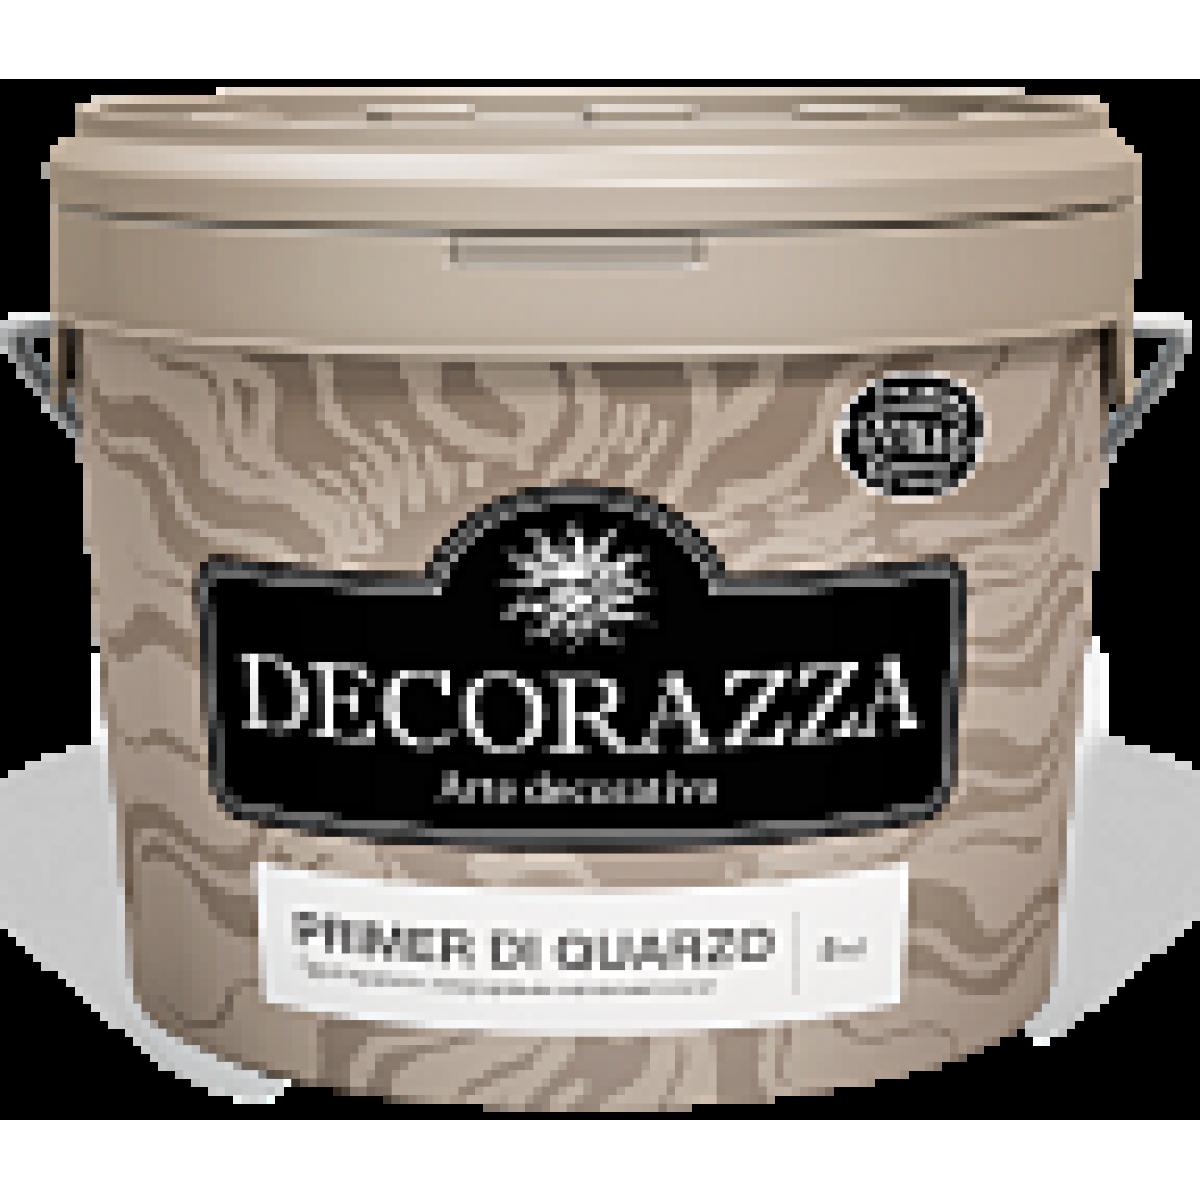 Decorazza Primer Di Quarzo - Грунт-краска с кварцевым наполнителем